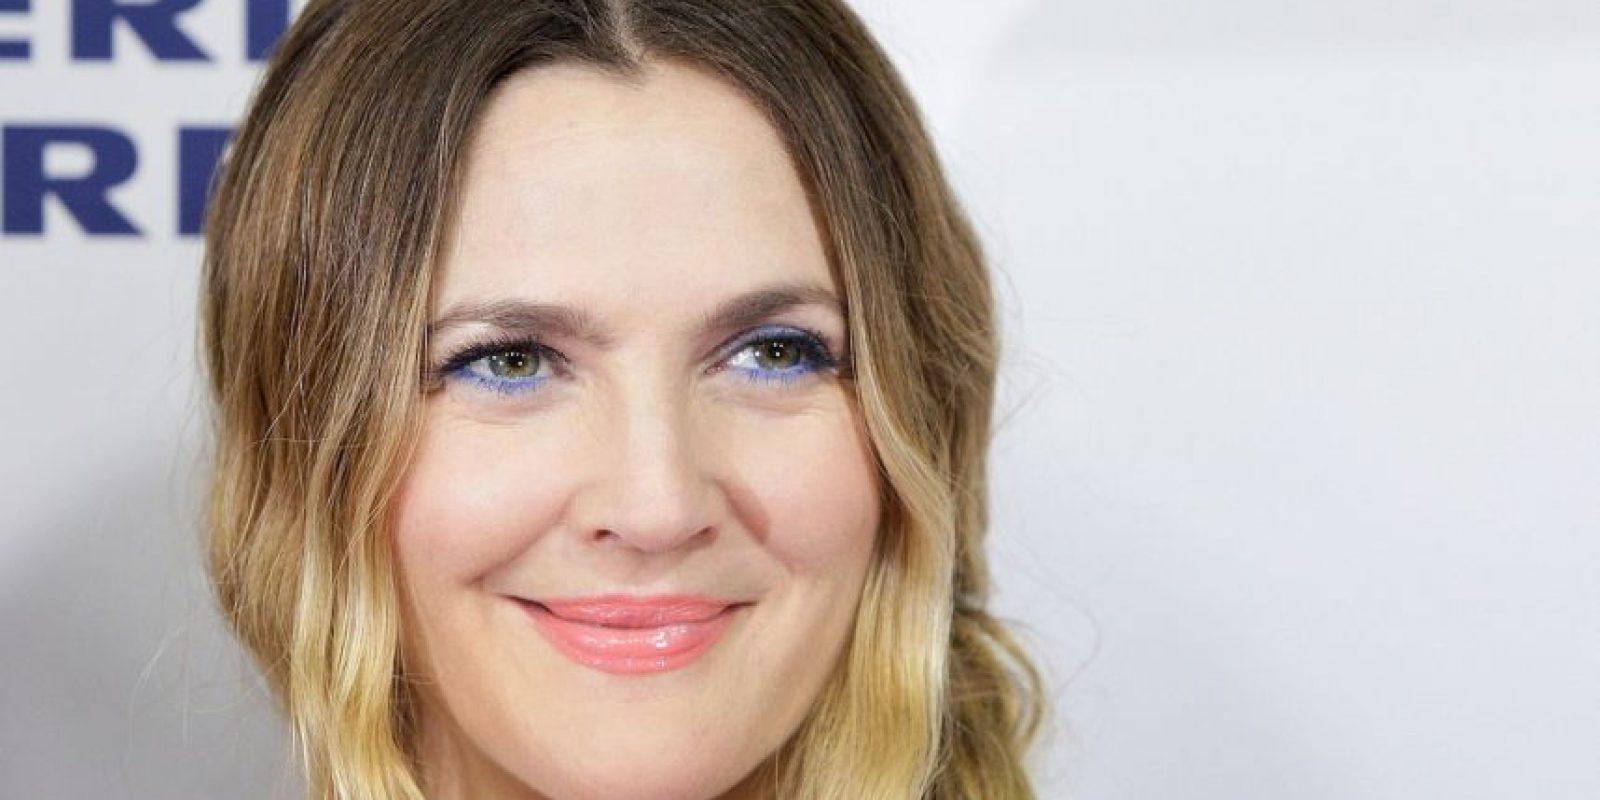 A sus 40 años luce así. Foto:Getty Images